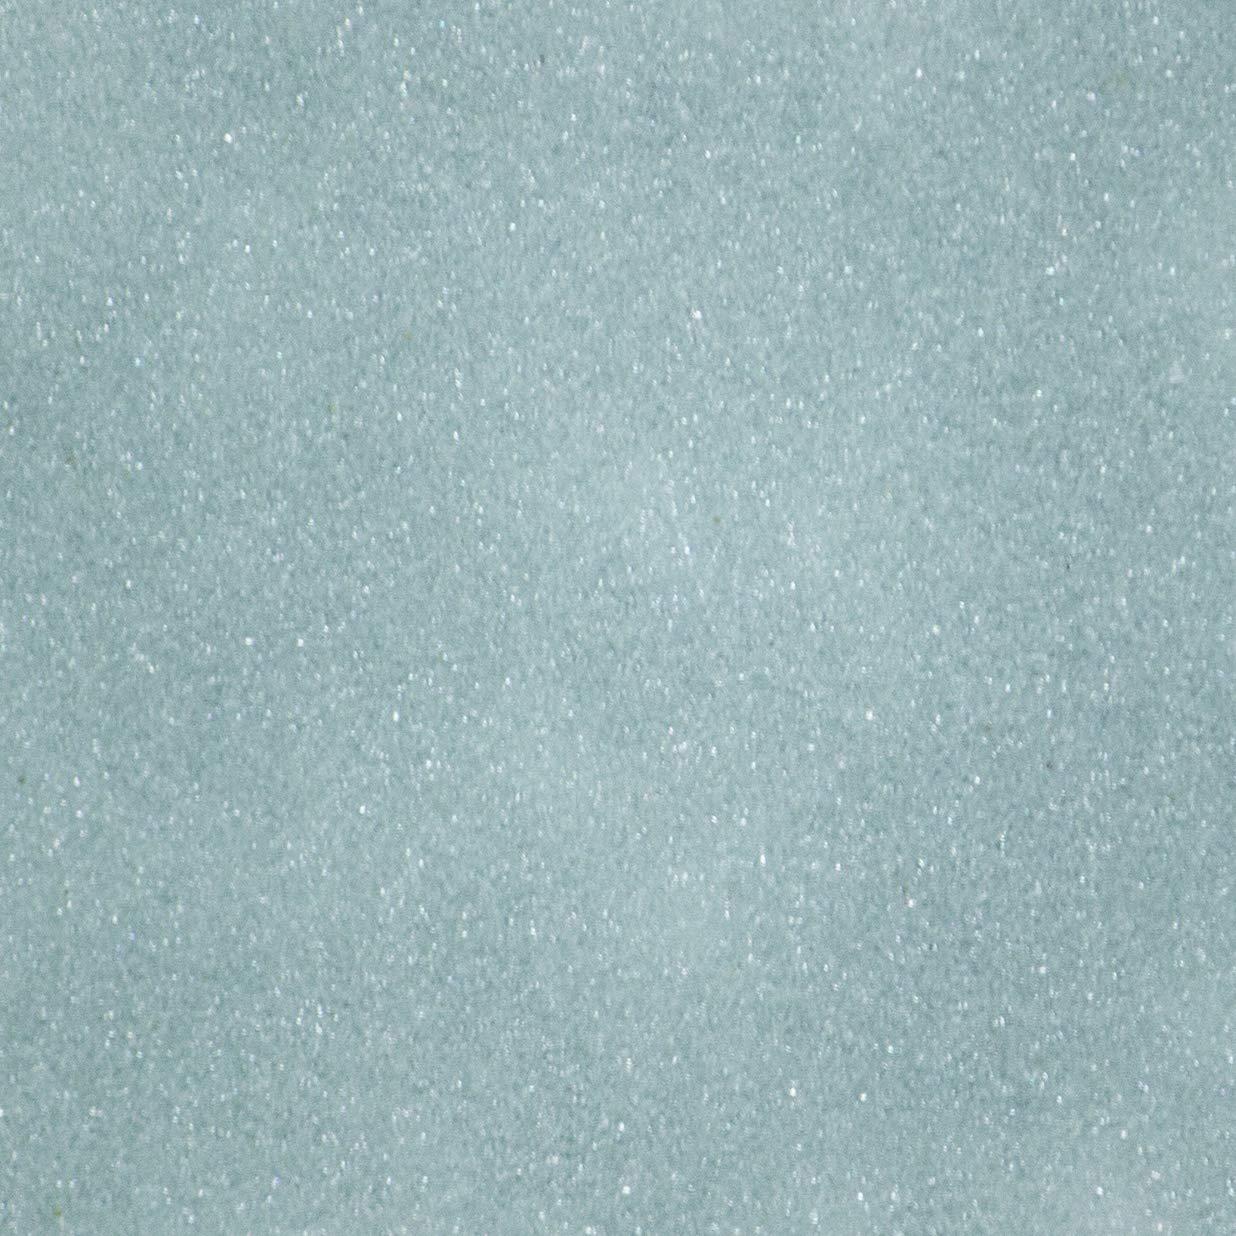 Bostik Dimension StarGlass Grout 660 Aquamarine 9 lbs by Bostik Dimension (Image #2)